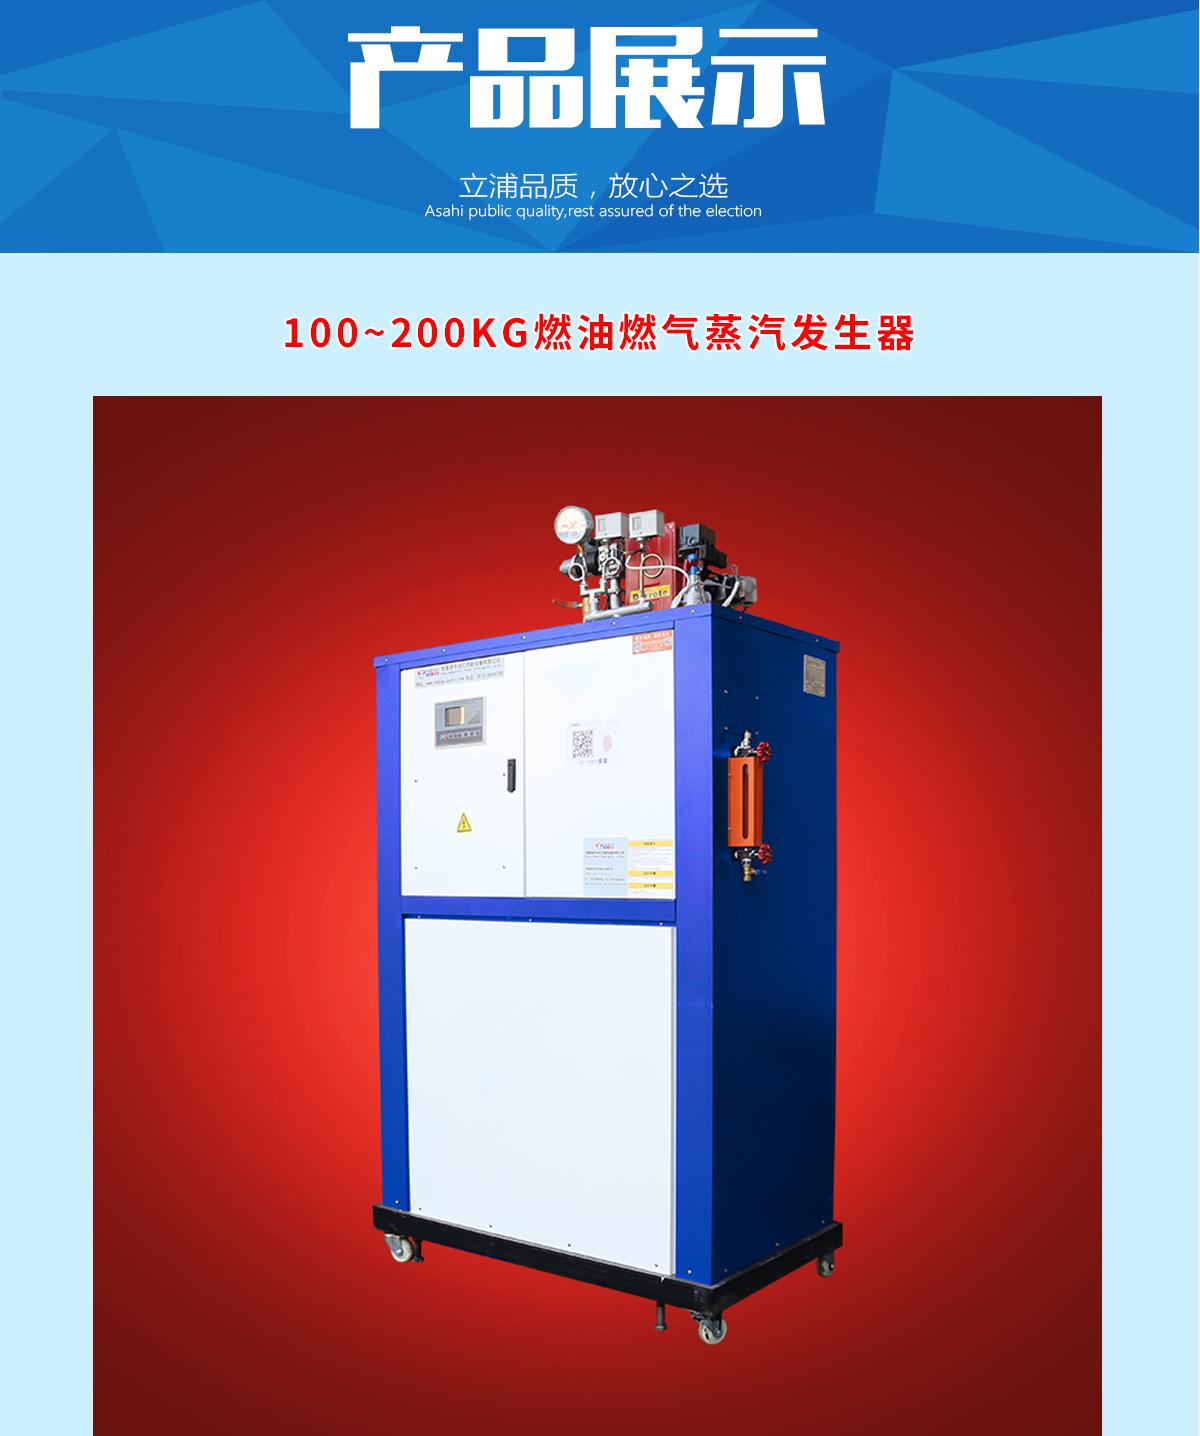 200KG藍色燃油燃氣蒸汽發生器1.jpg